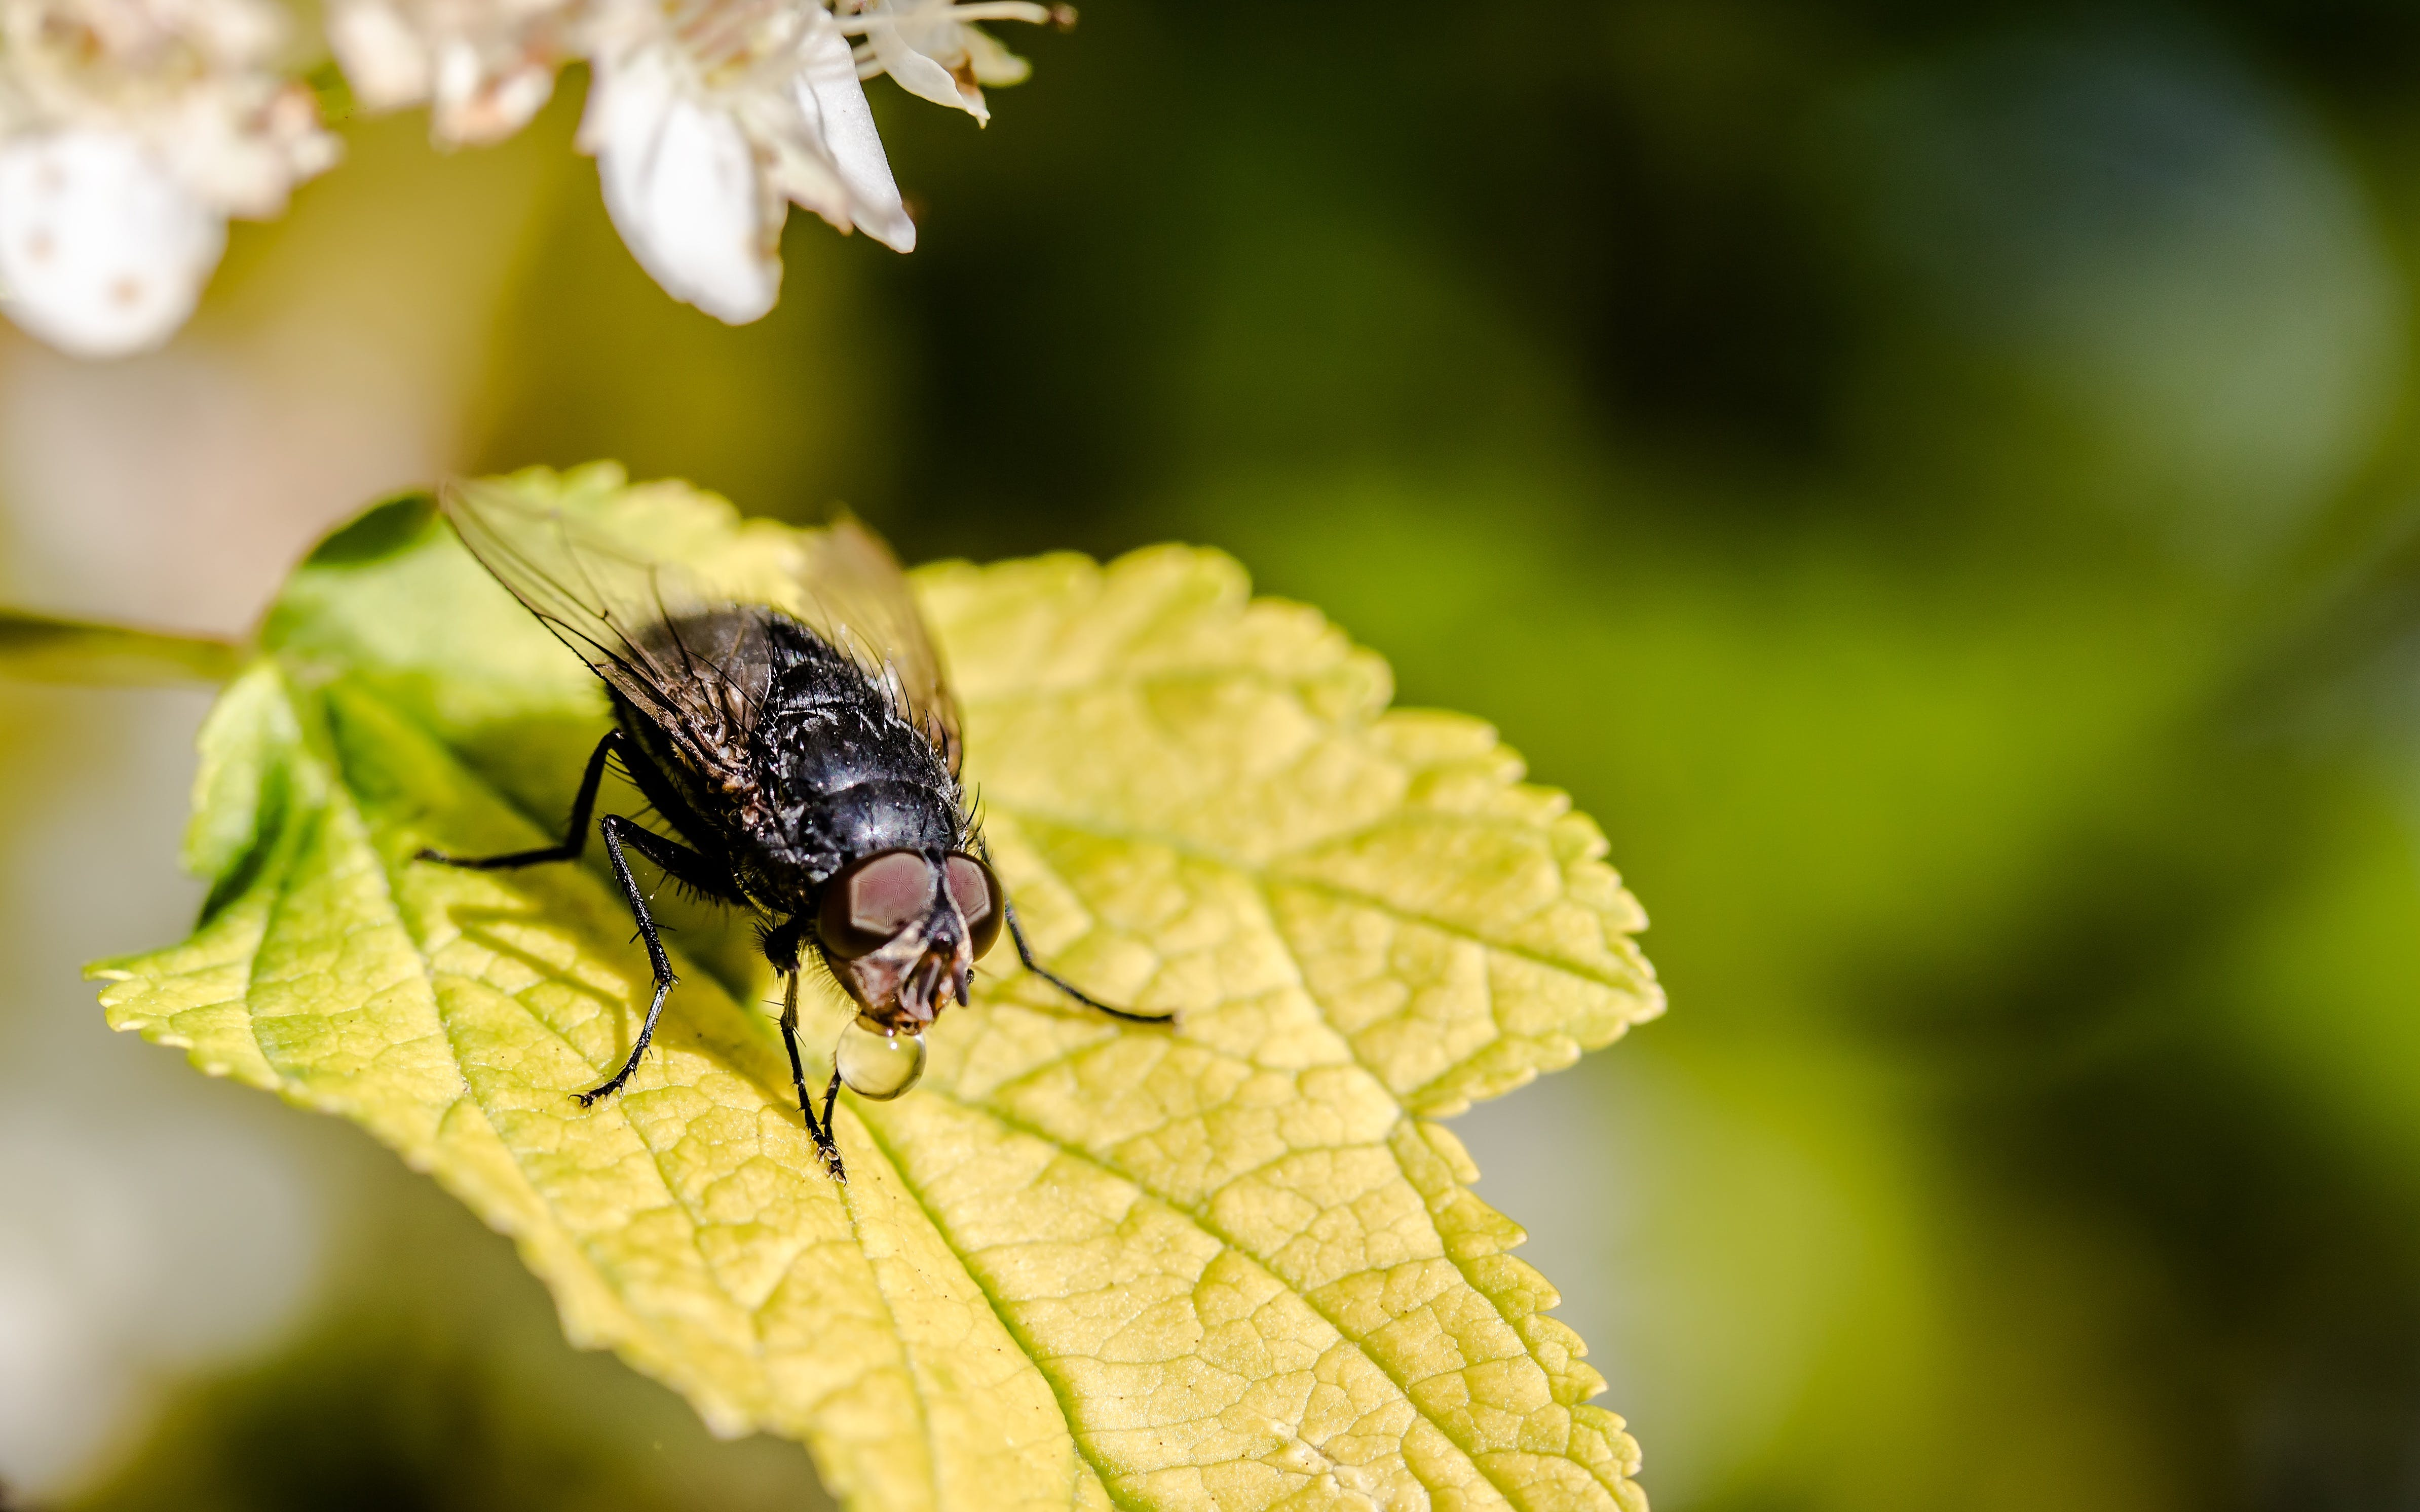 Macro Photography of Housefly on Maple Leaf